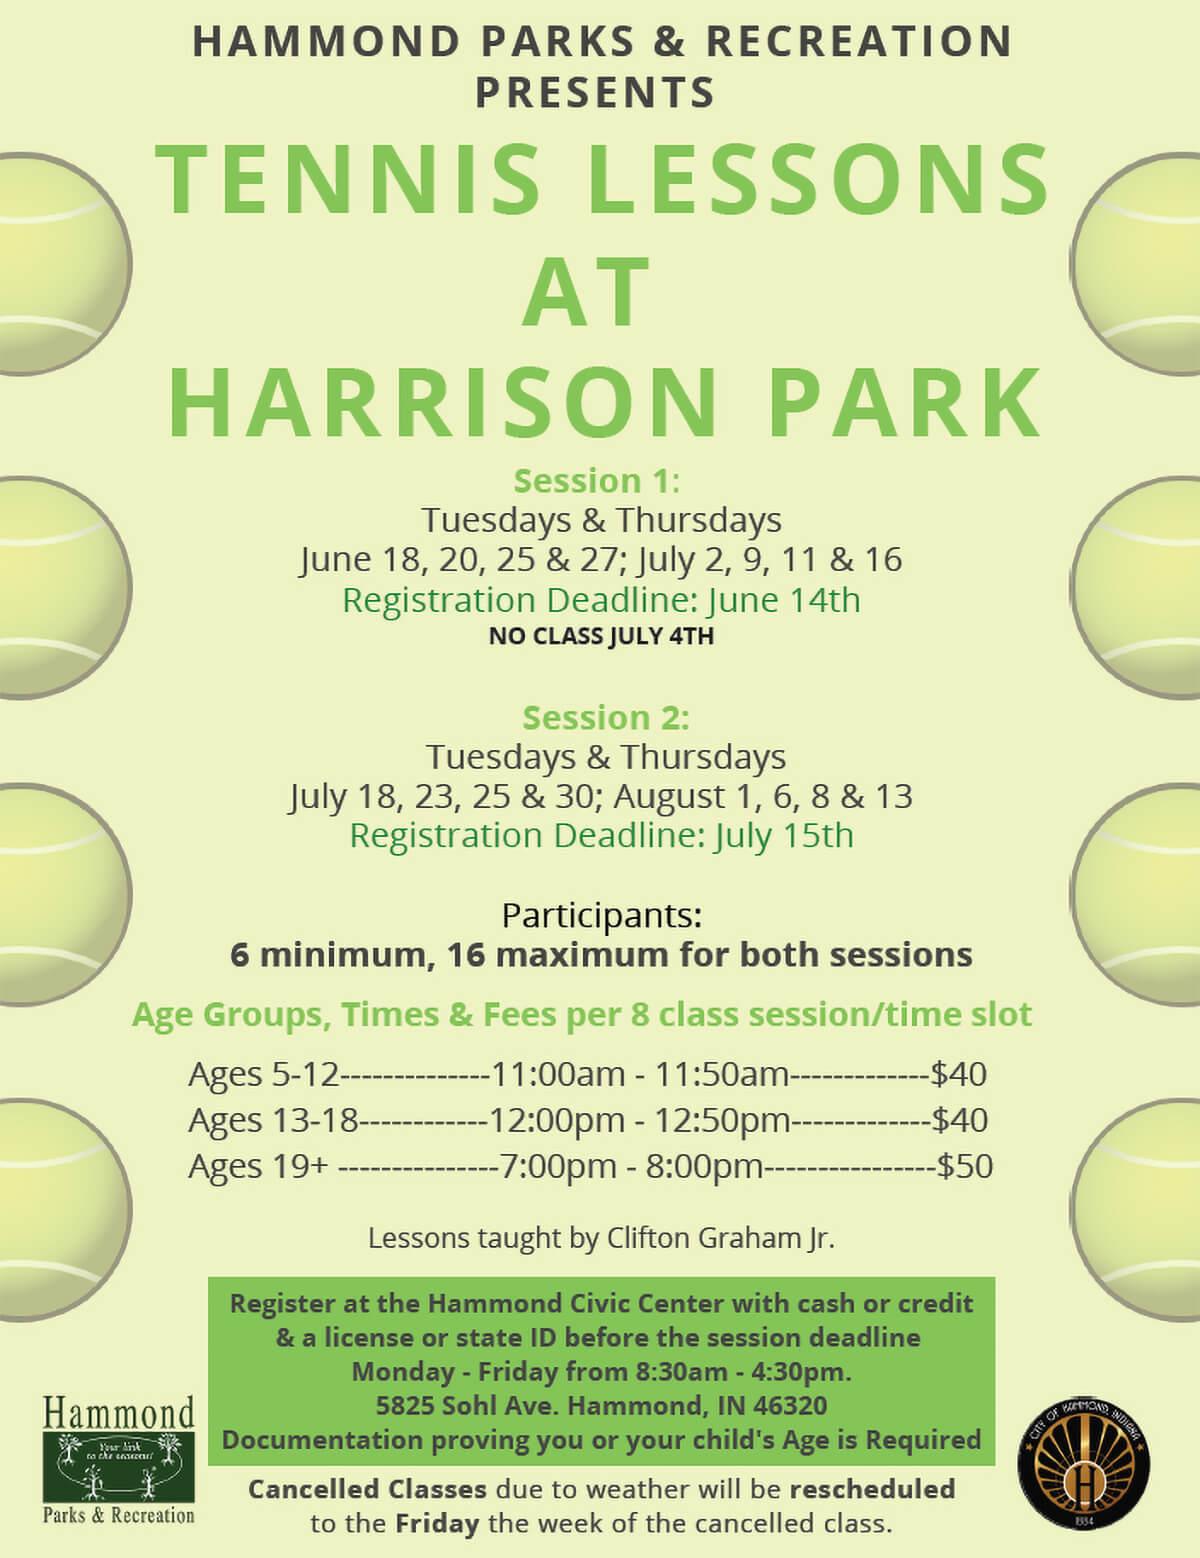 Tennis Lessons at Harrison Park